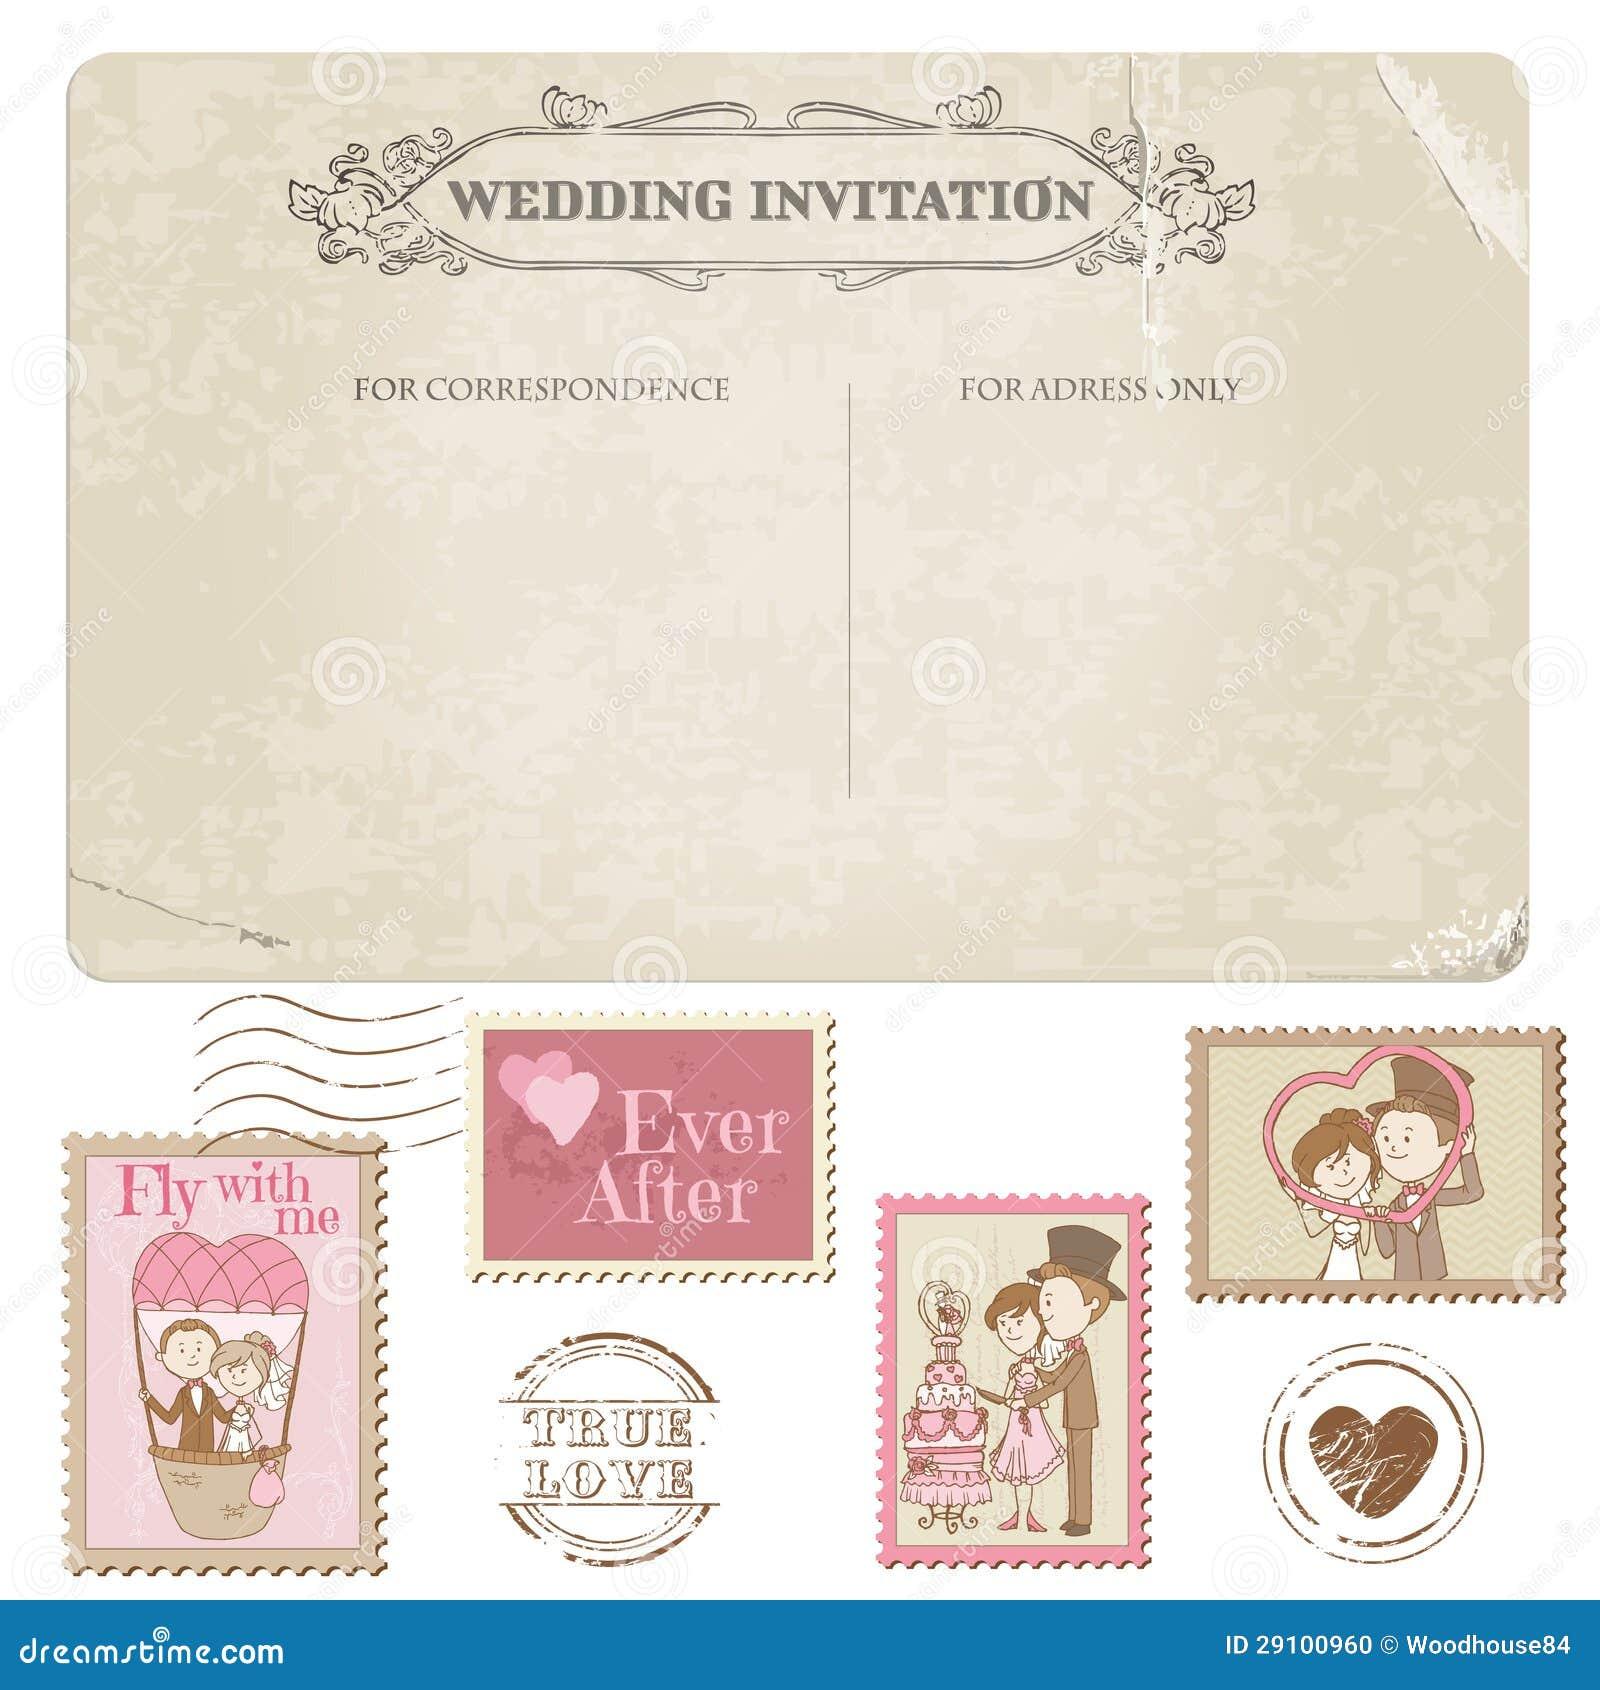 Wedding Postcard And Postage Stamps Stock Photo